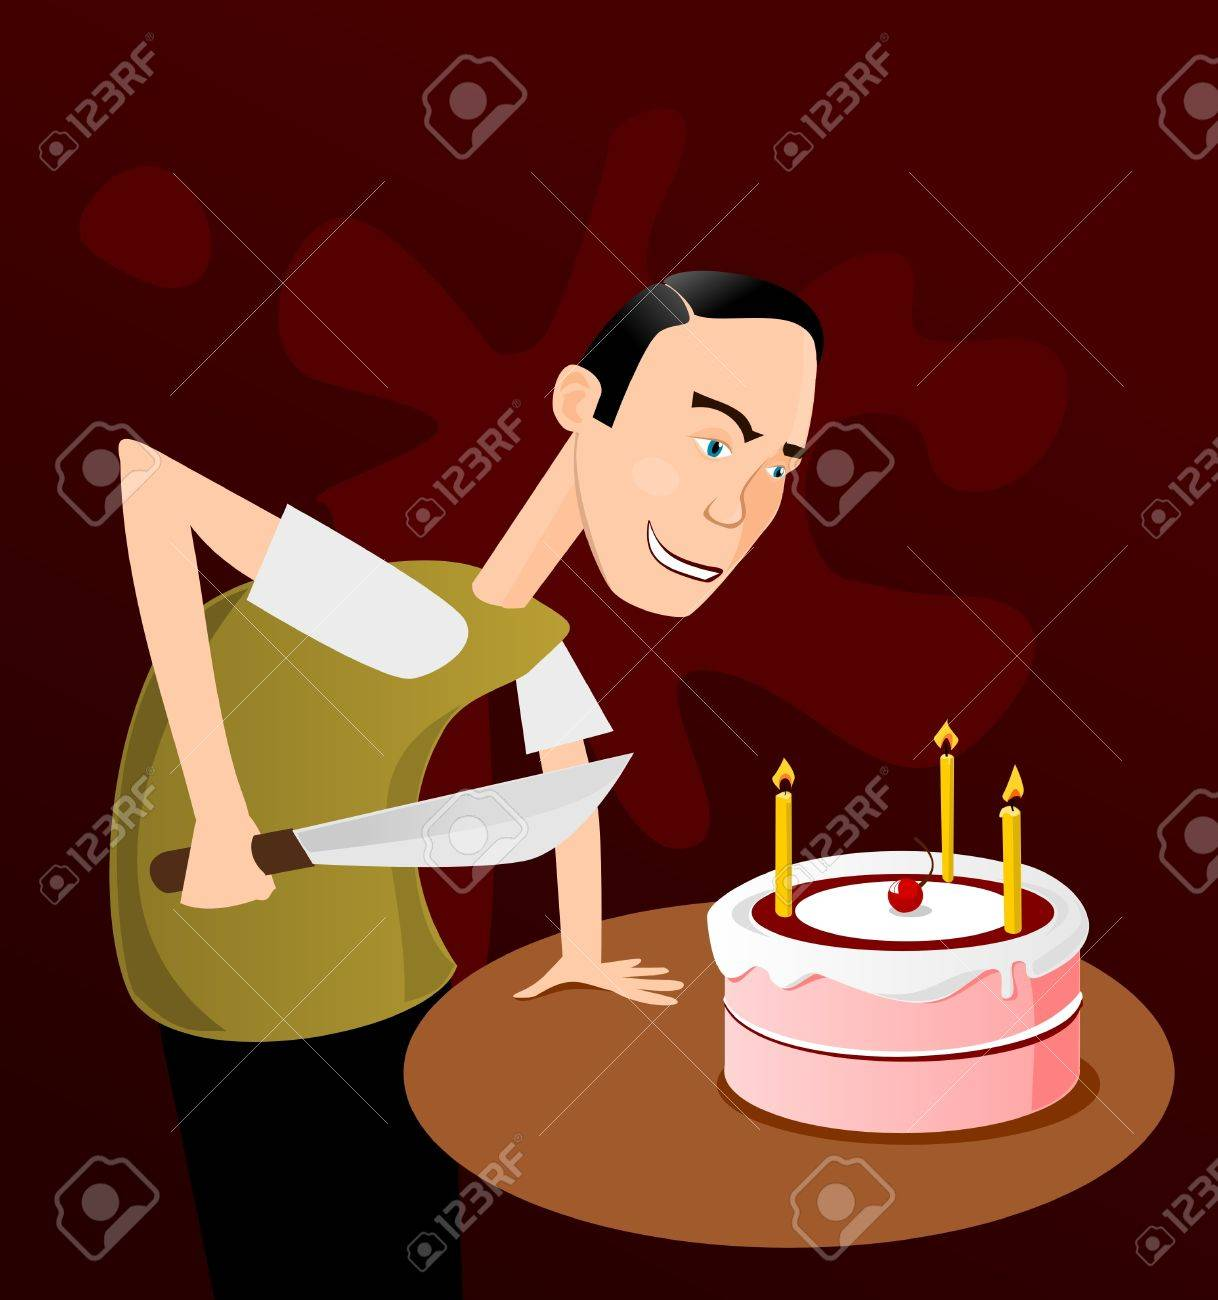 Phenomenal Man With Big Knife Ready To Cut A Cake Royalty Free Cliparts Funny Birthday Cards Online Benoljebrpdamsfinfo